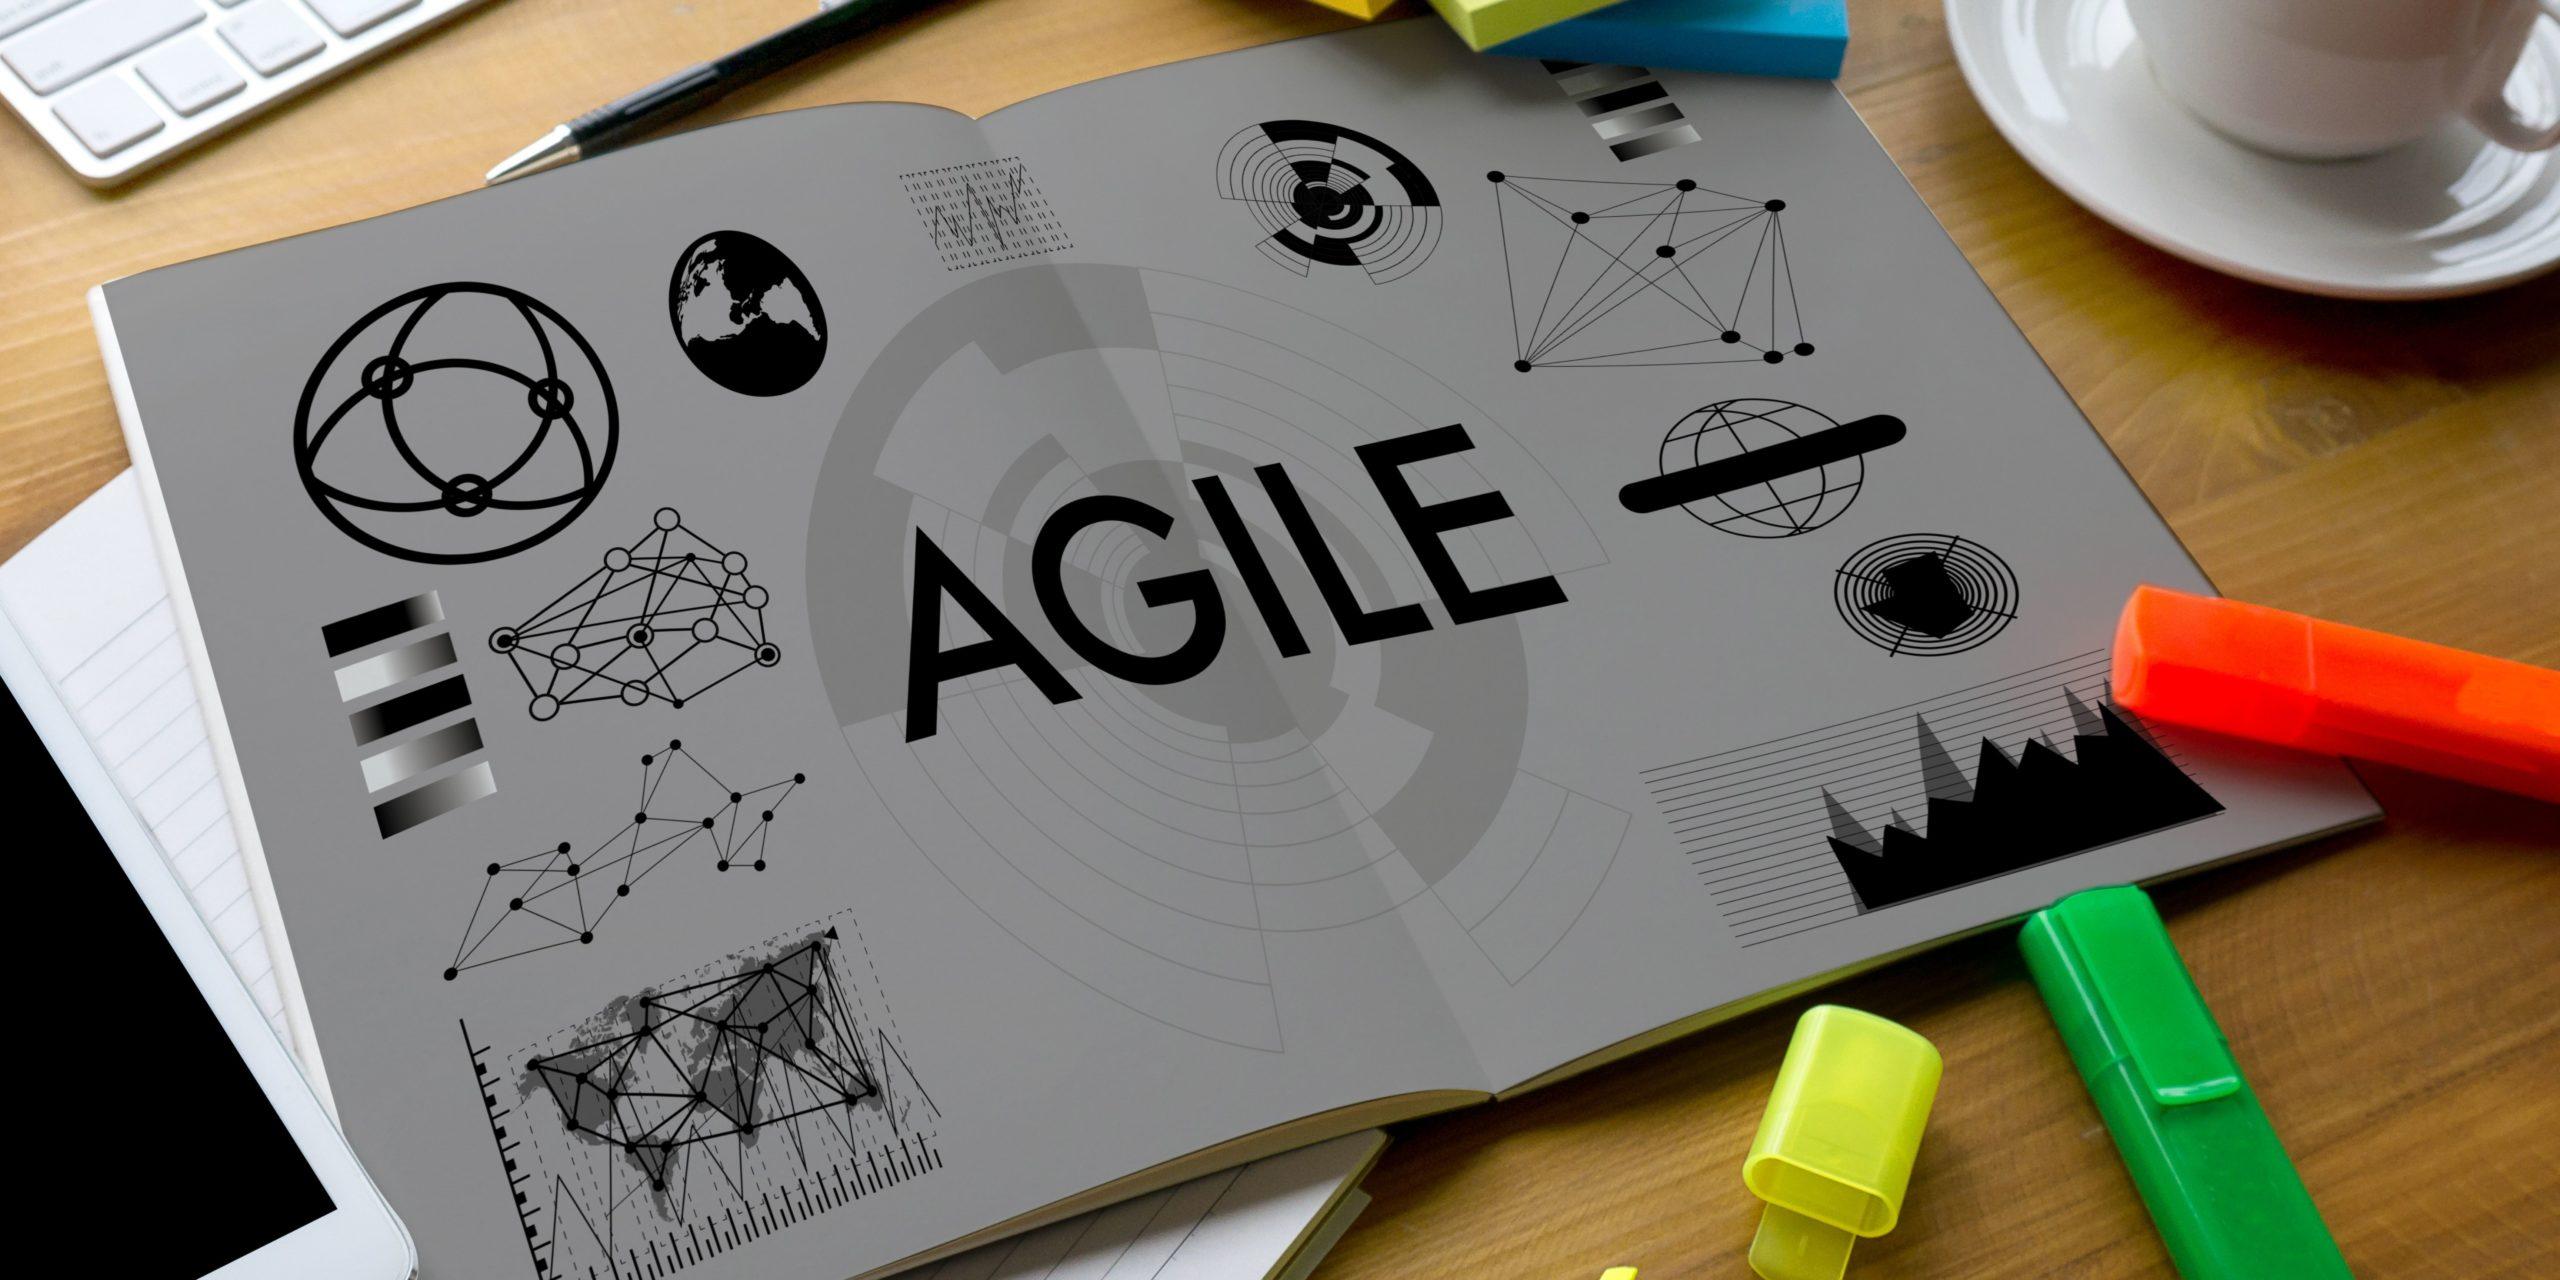 https://www.contentbloom.com/wp-content/uploads/2021/08/agile-scaled.jpeg